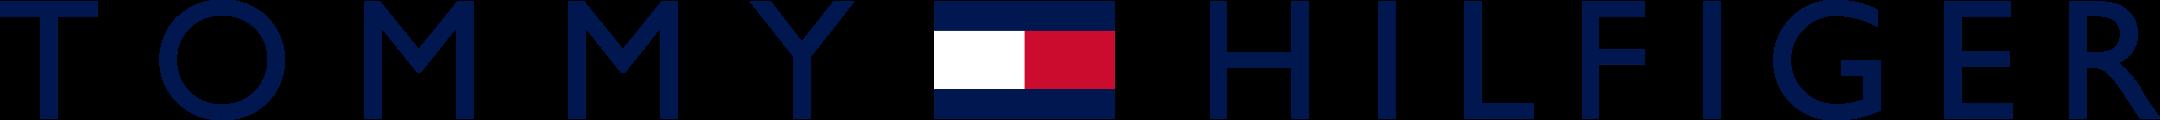 tommy hilfiger 1 - Tommy Hilfiger Logo